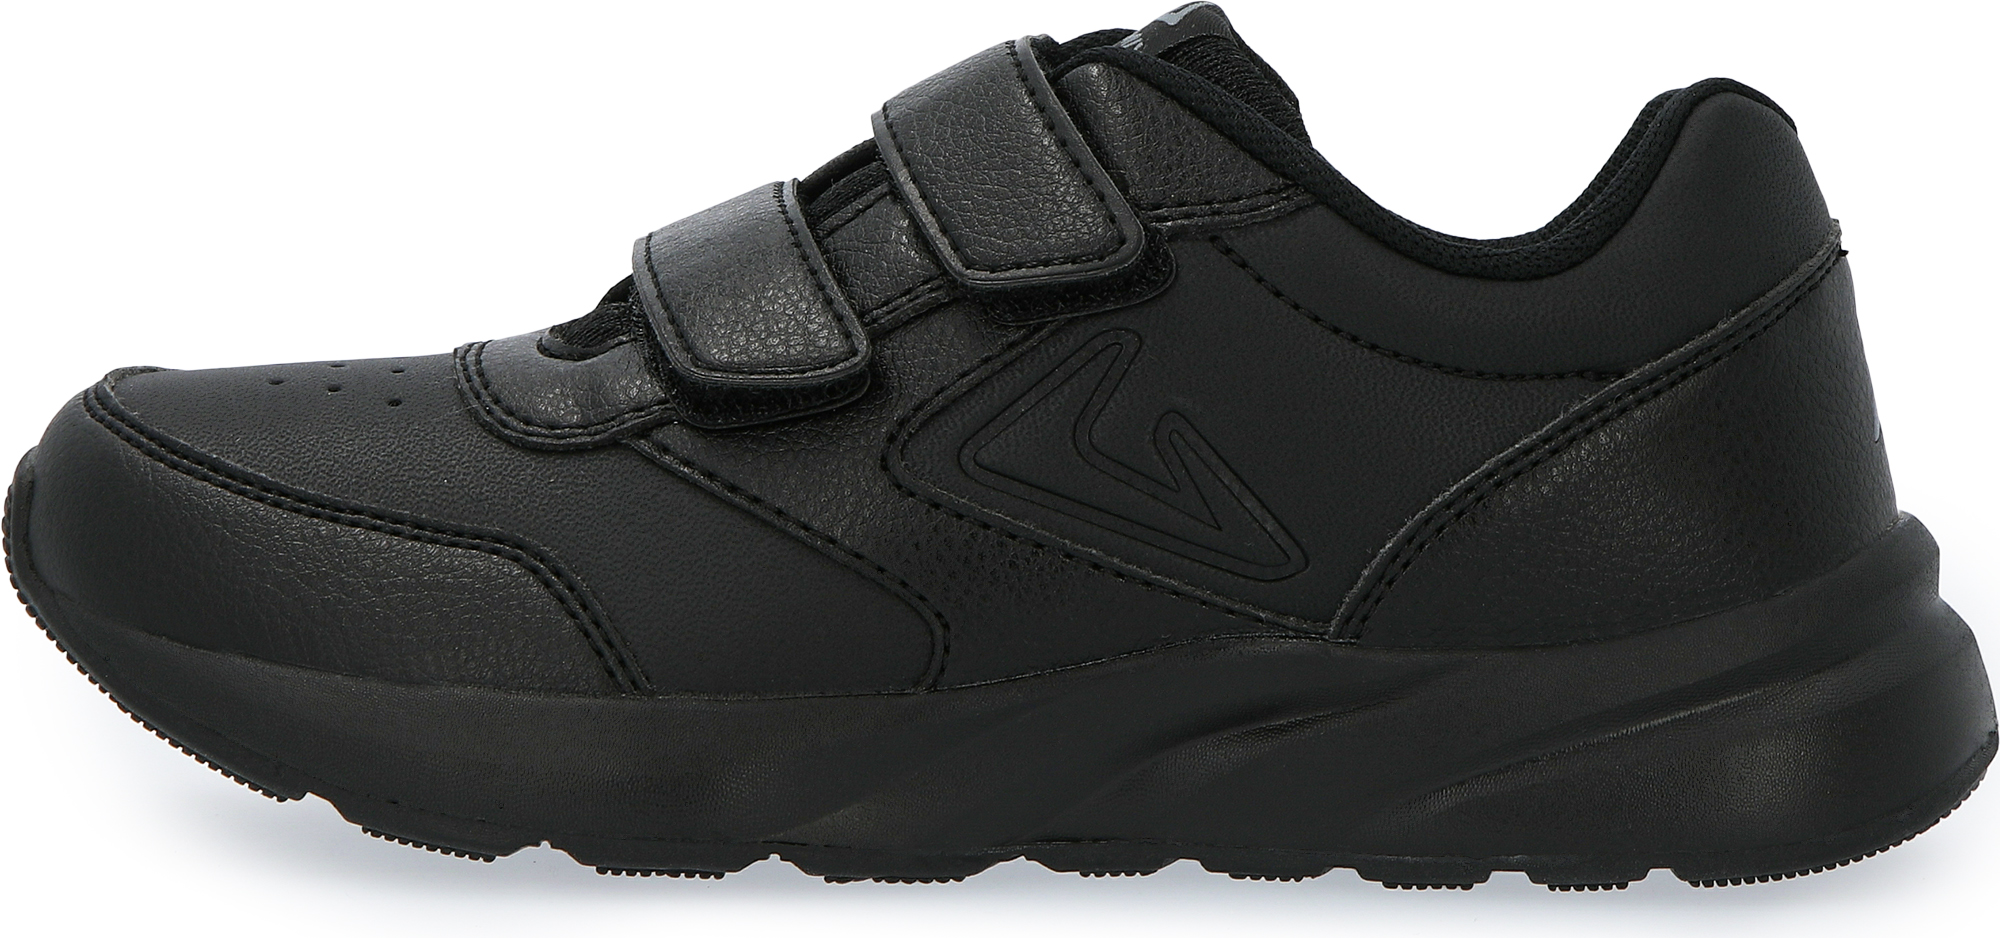 Demix Кроссовки для мальчиков Demix Sport Pu, размер 34 demix кроссовки для мальчиков demix sport размер 34